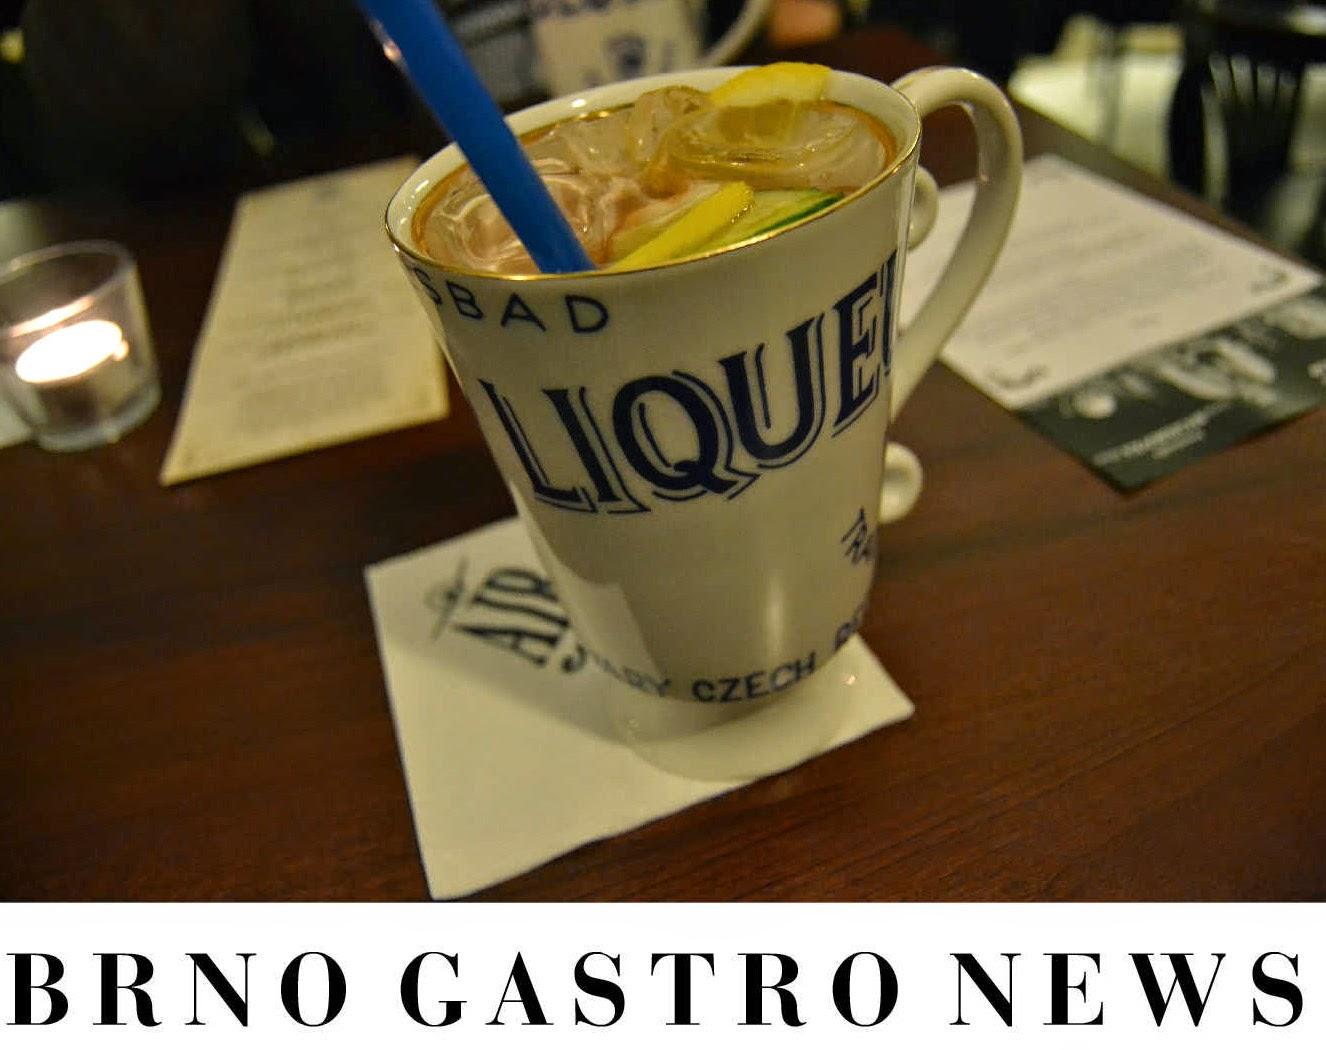 BRNO gastro news